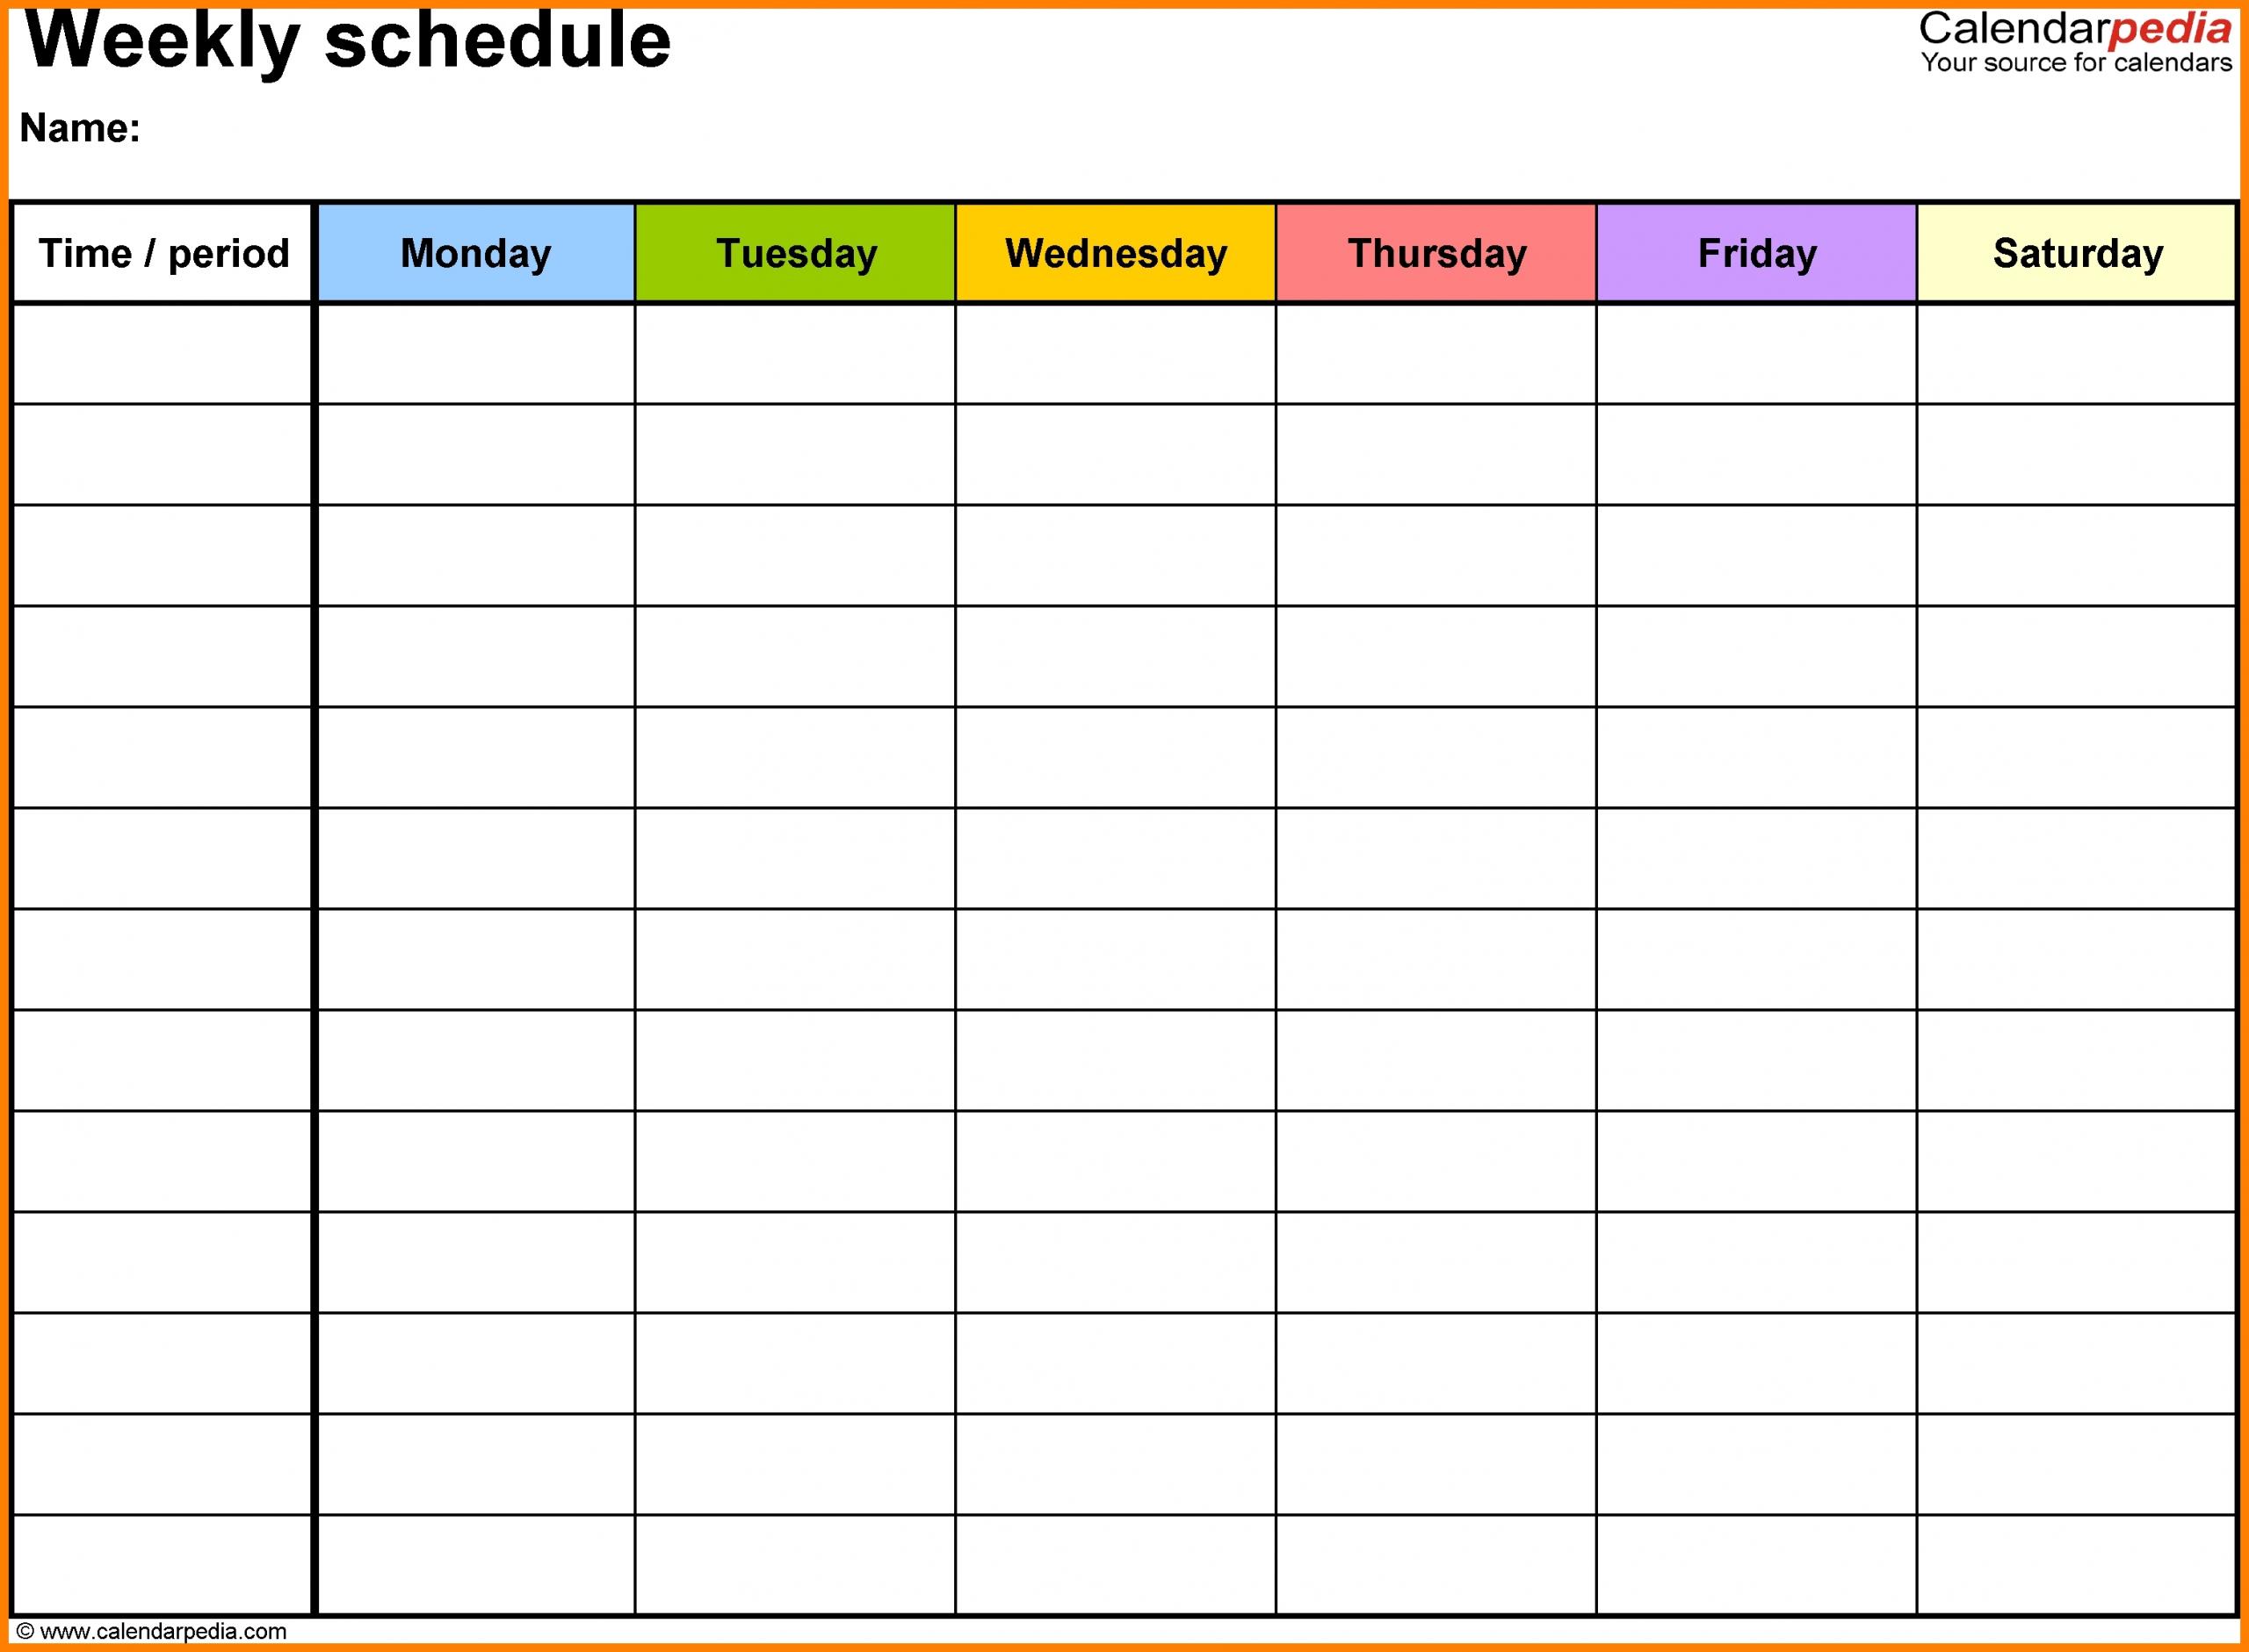 Printable Weekly Calendar With Time Slots - Calendar Inspiration Design